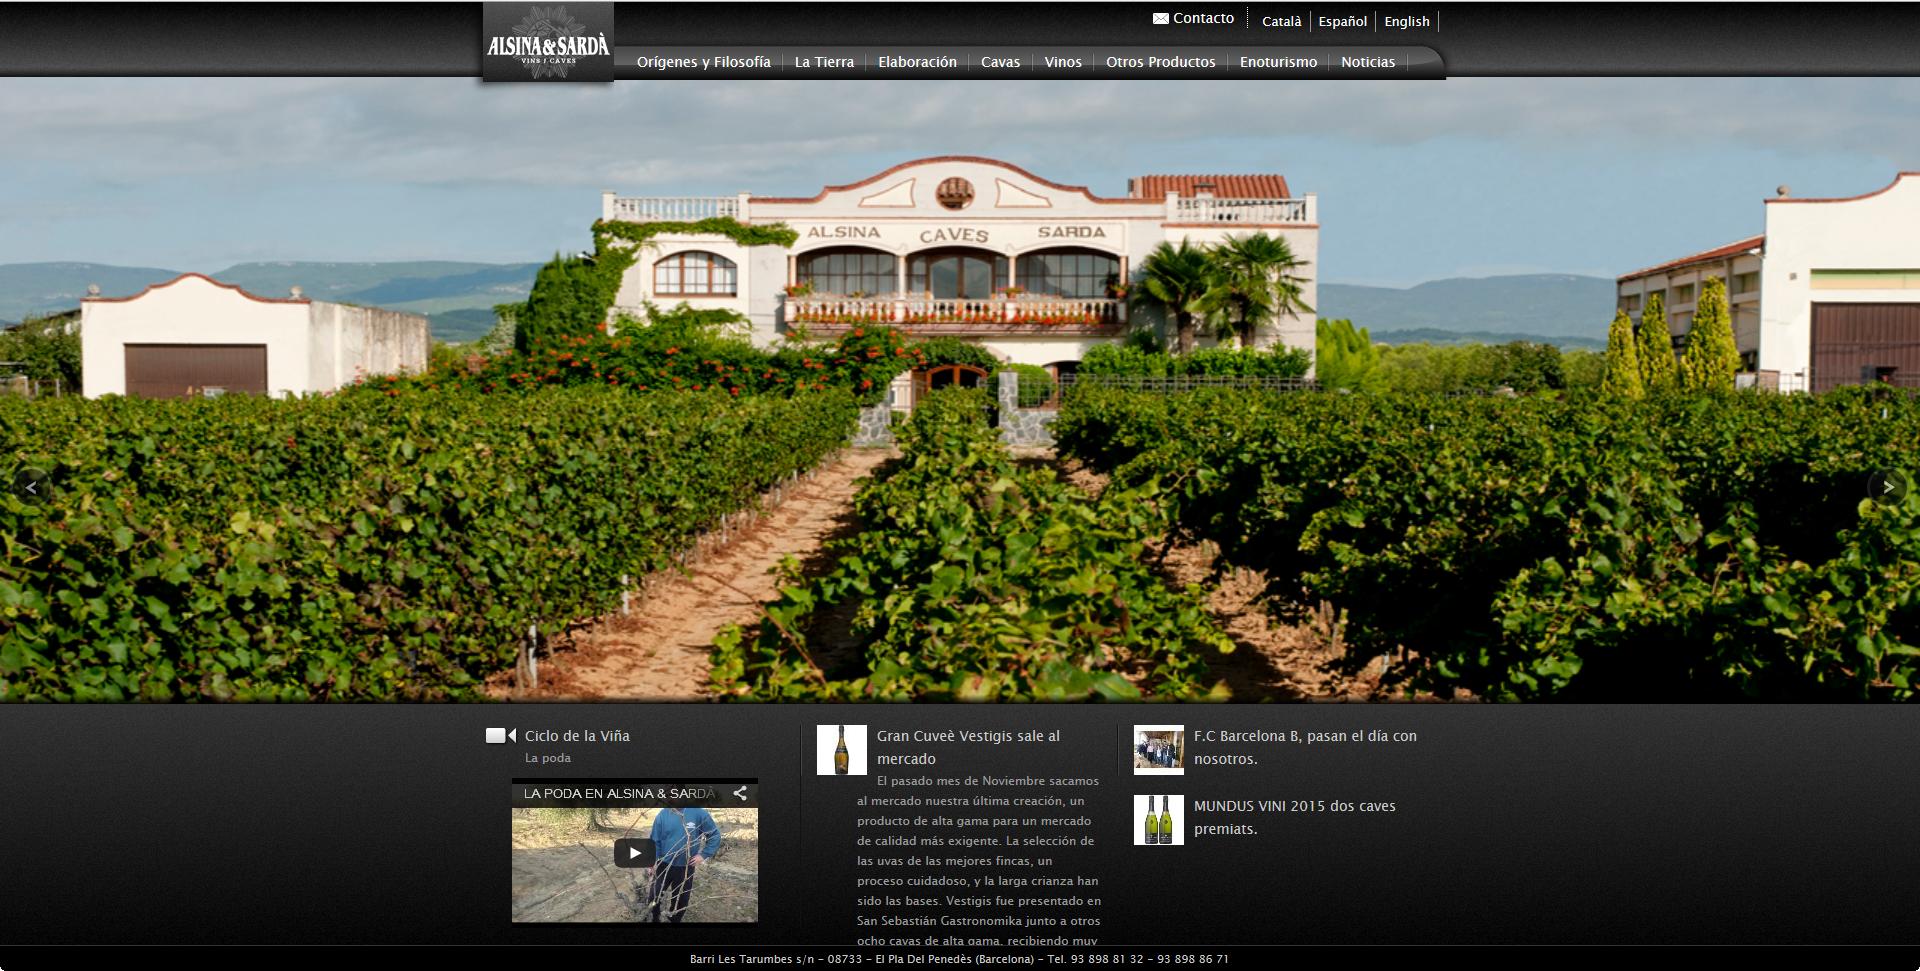 AlsinaSarda.com – Web con Gestor Documental OpenSource